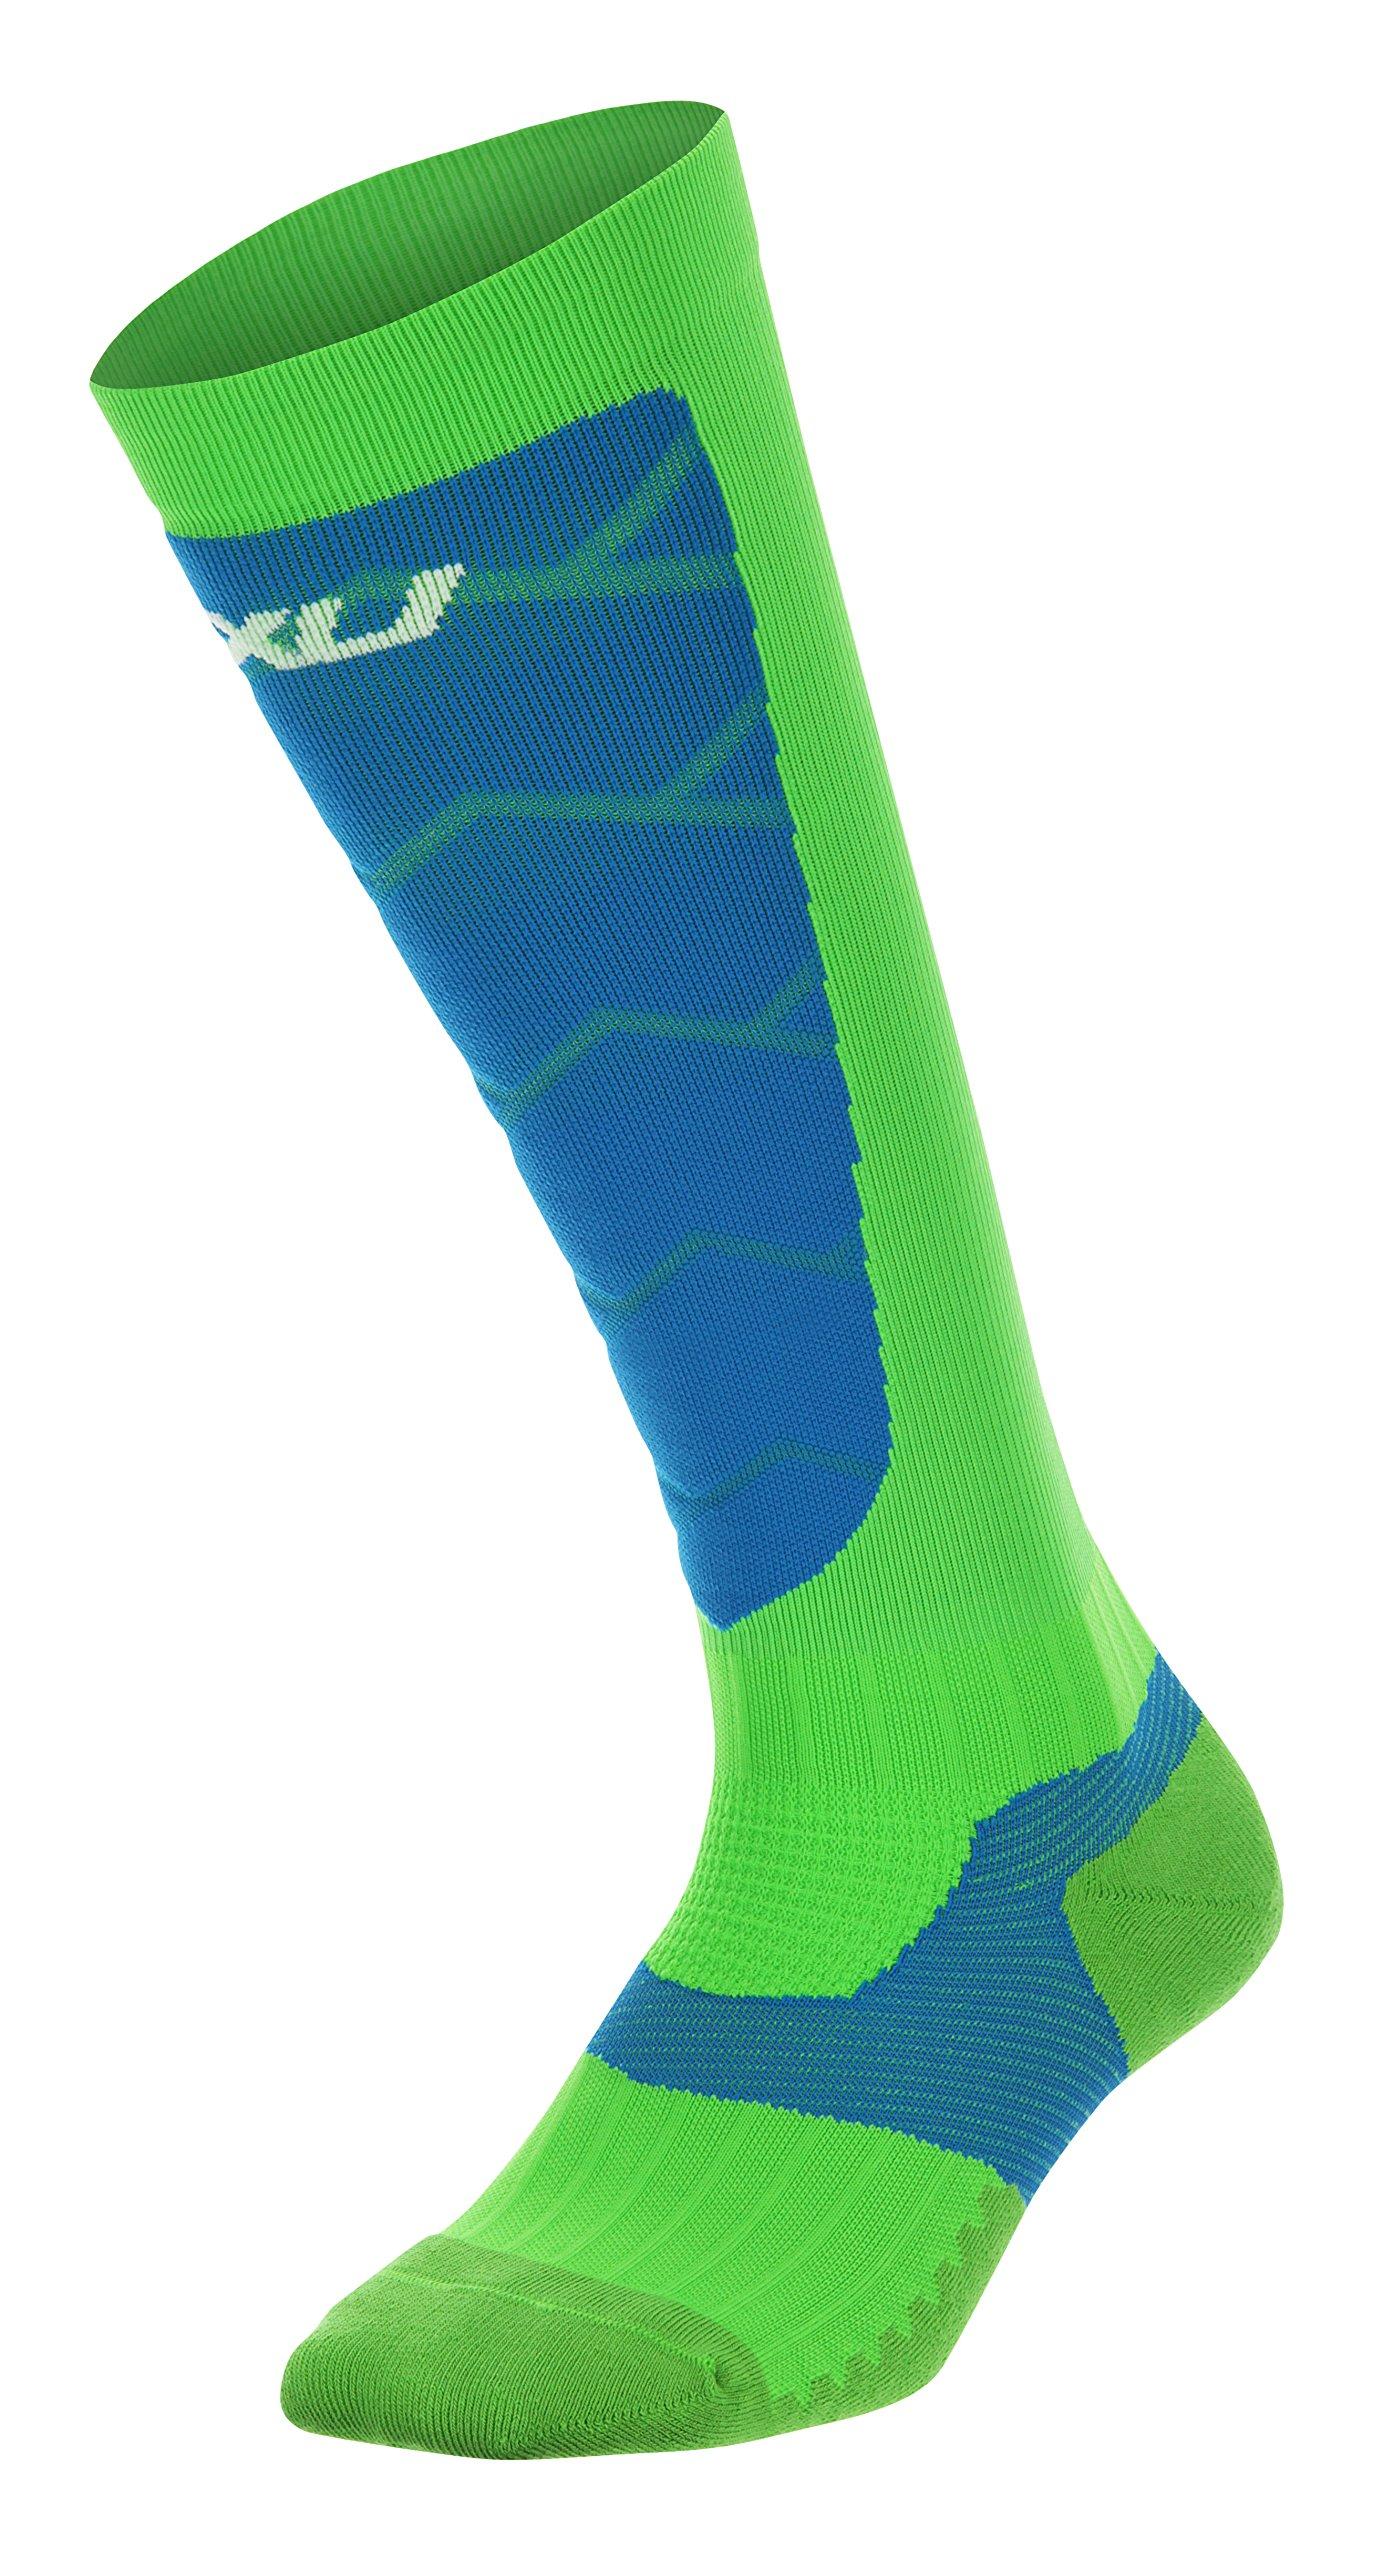 2XU Men's Elite Compression Alpine Socks, Gecko